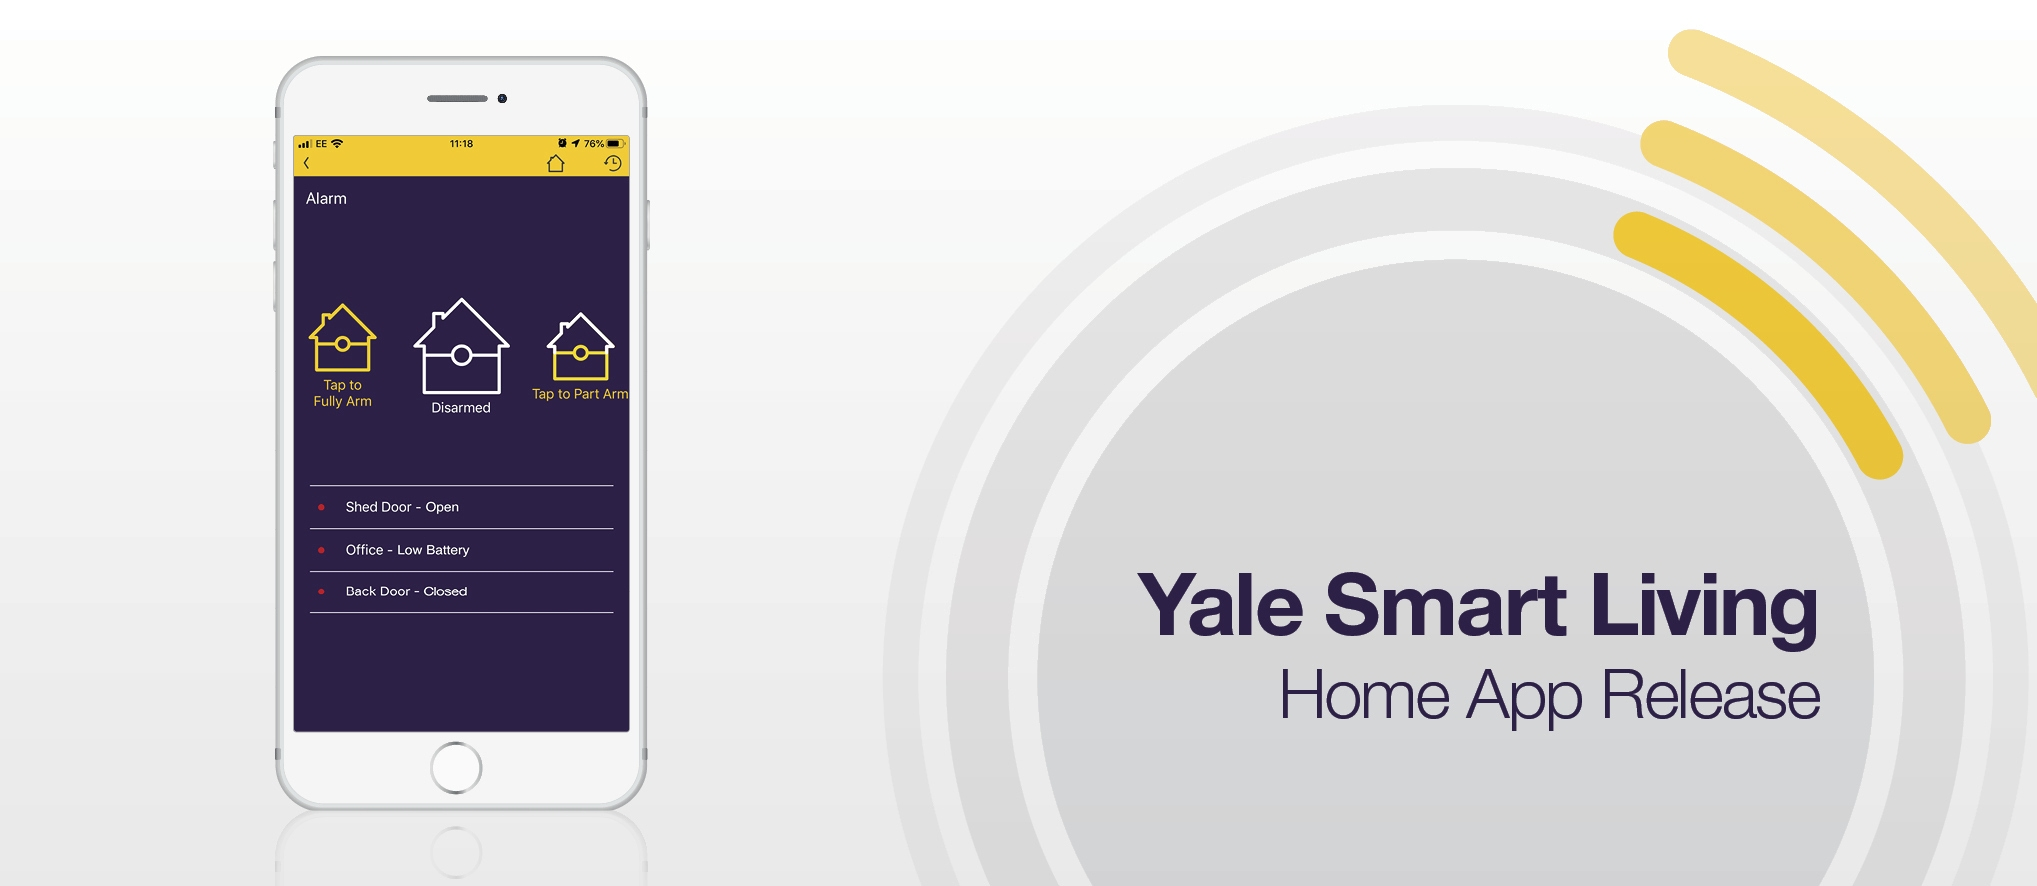 Smart Living Home App Update